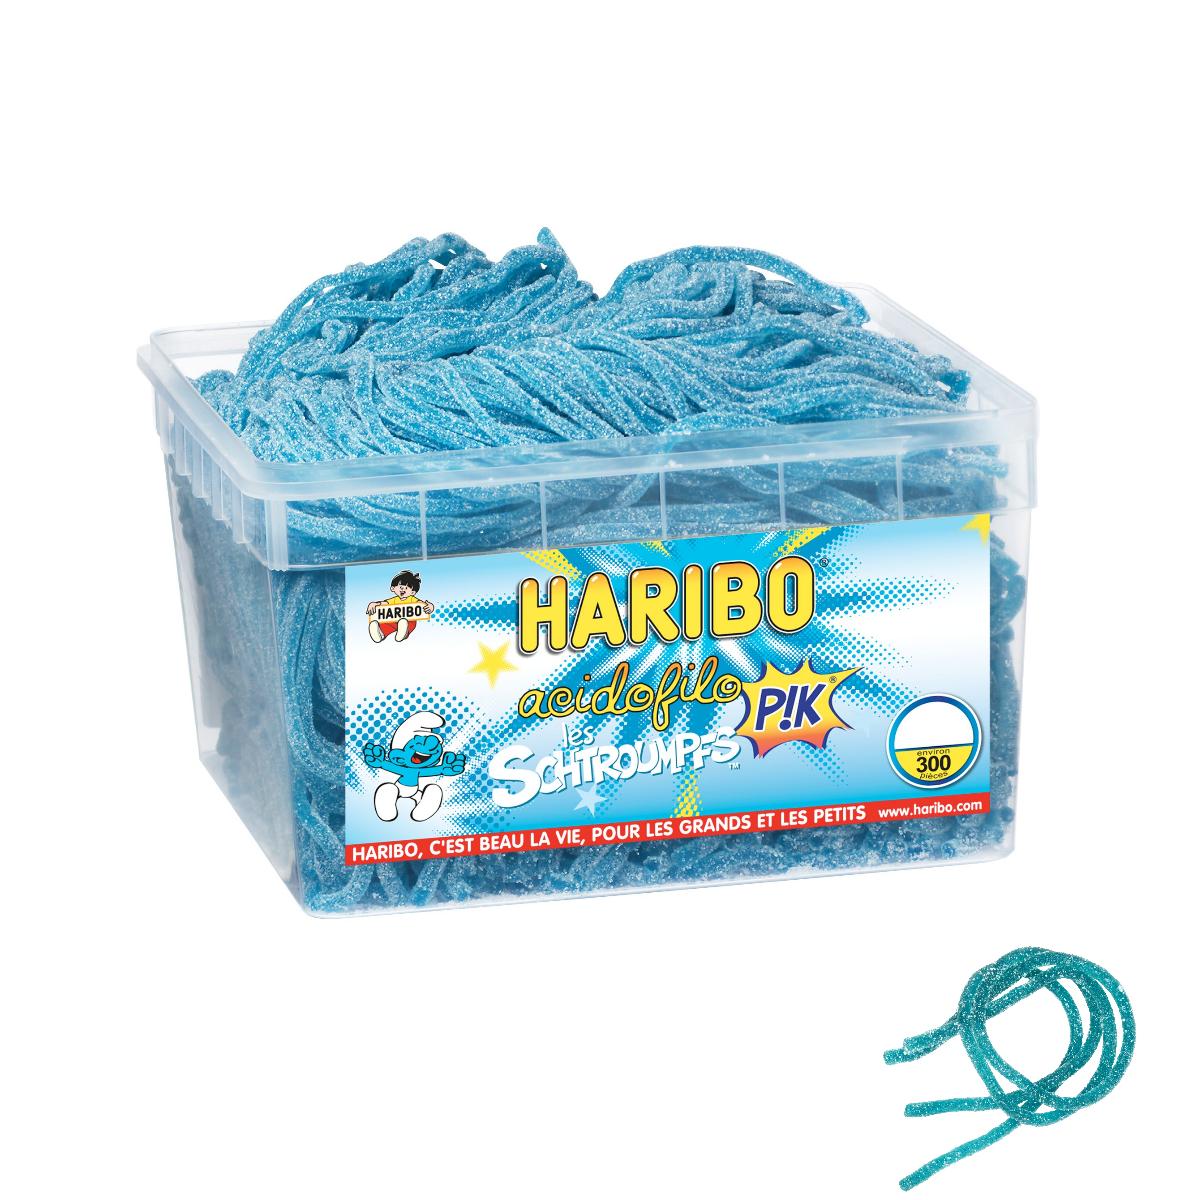 bonbon-haribo-acidofilo-Schtroumpfs -pik